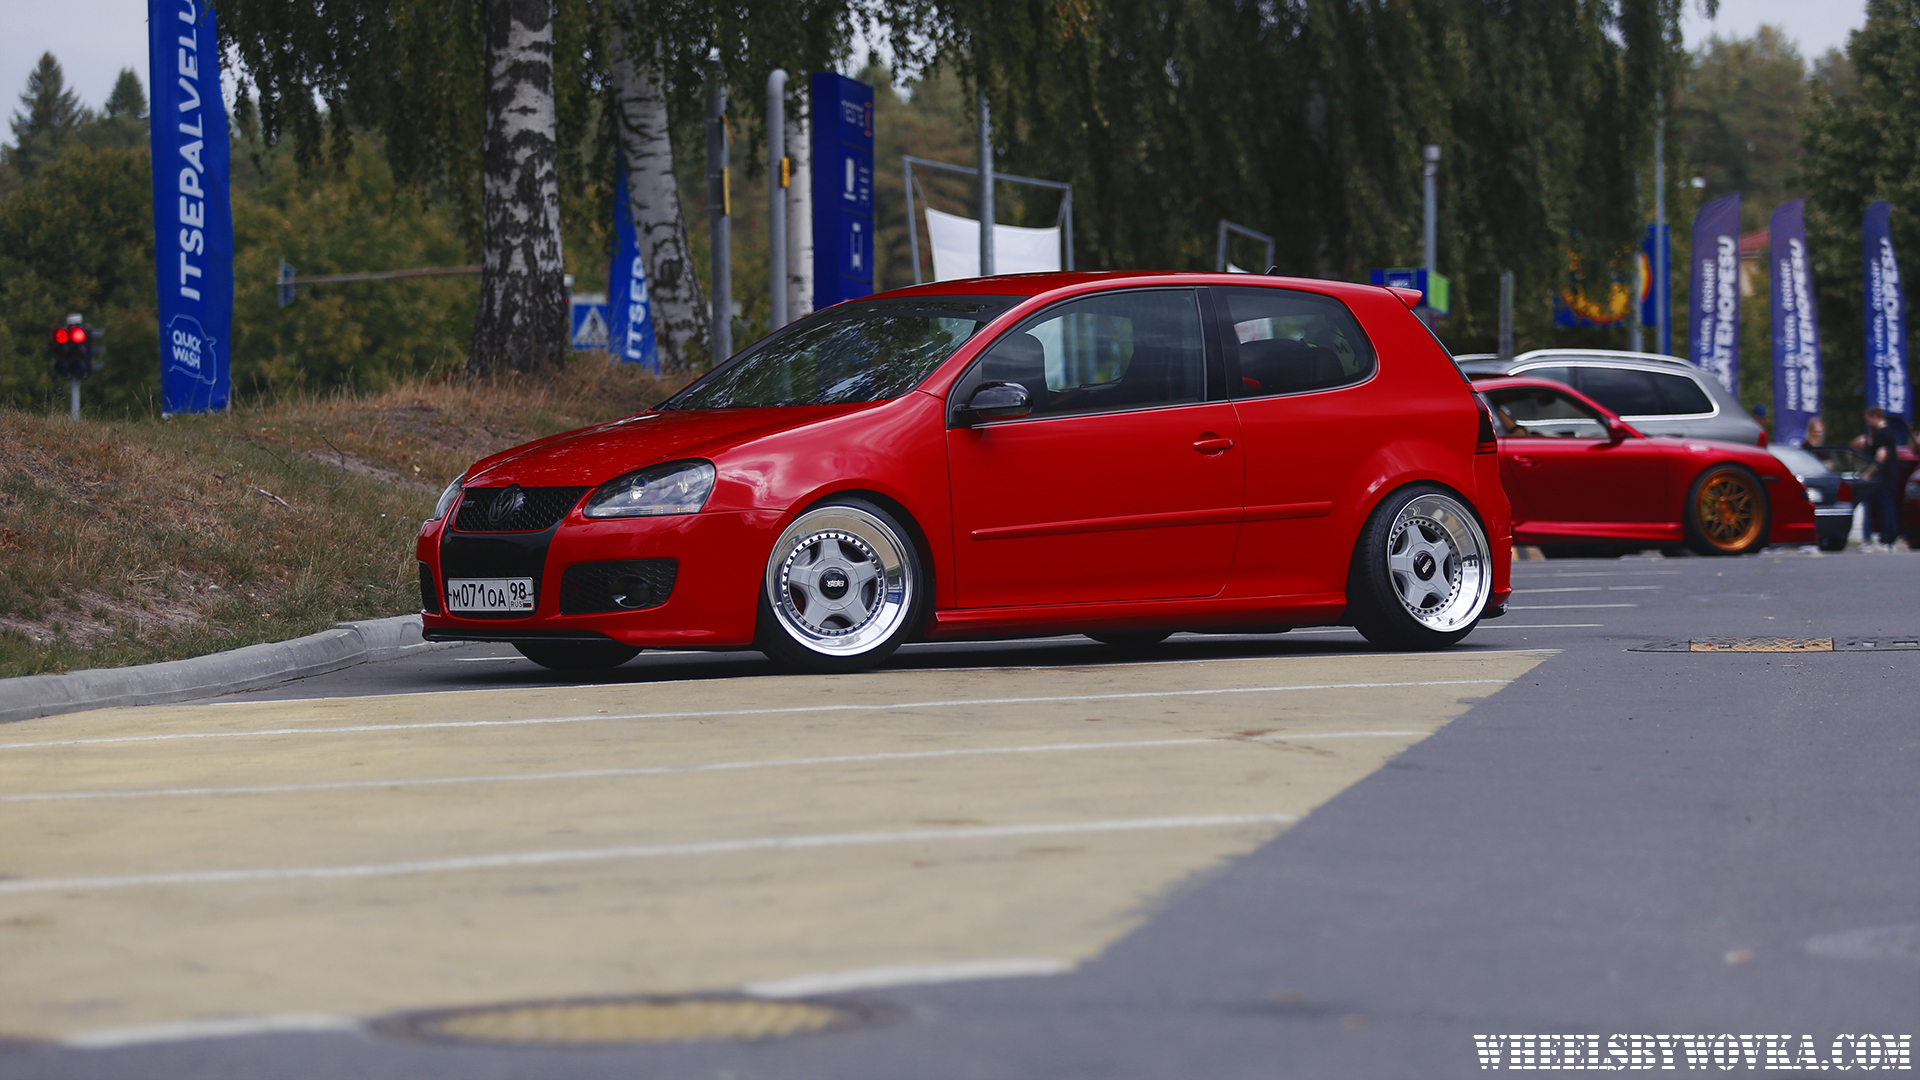 fitted-fest-lahti-finland-cdlcco-2018-by-wheelsbywovka-4